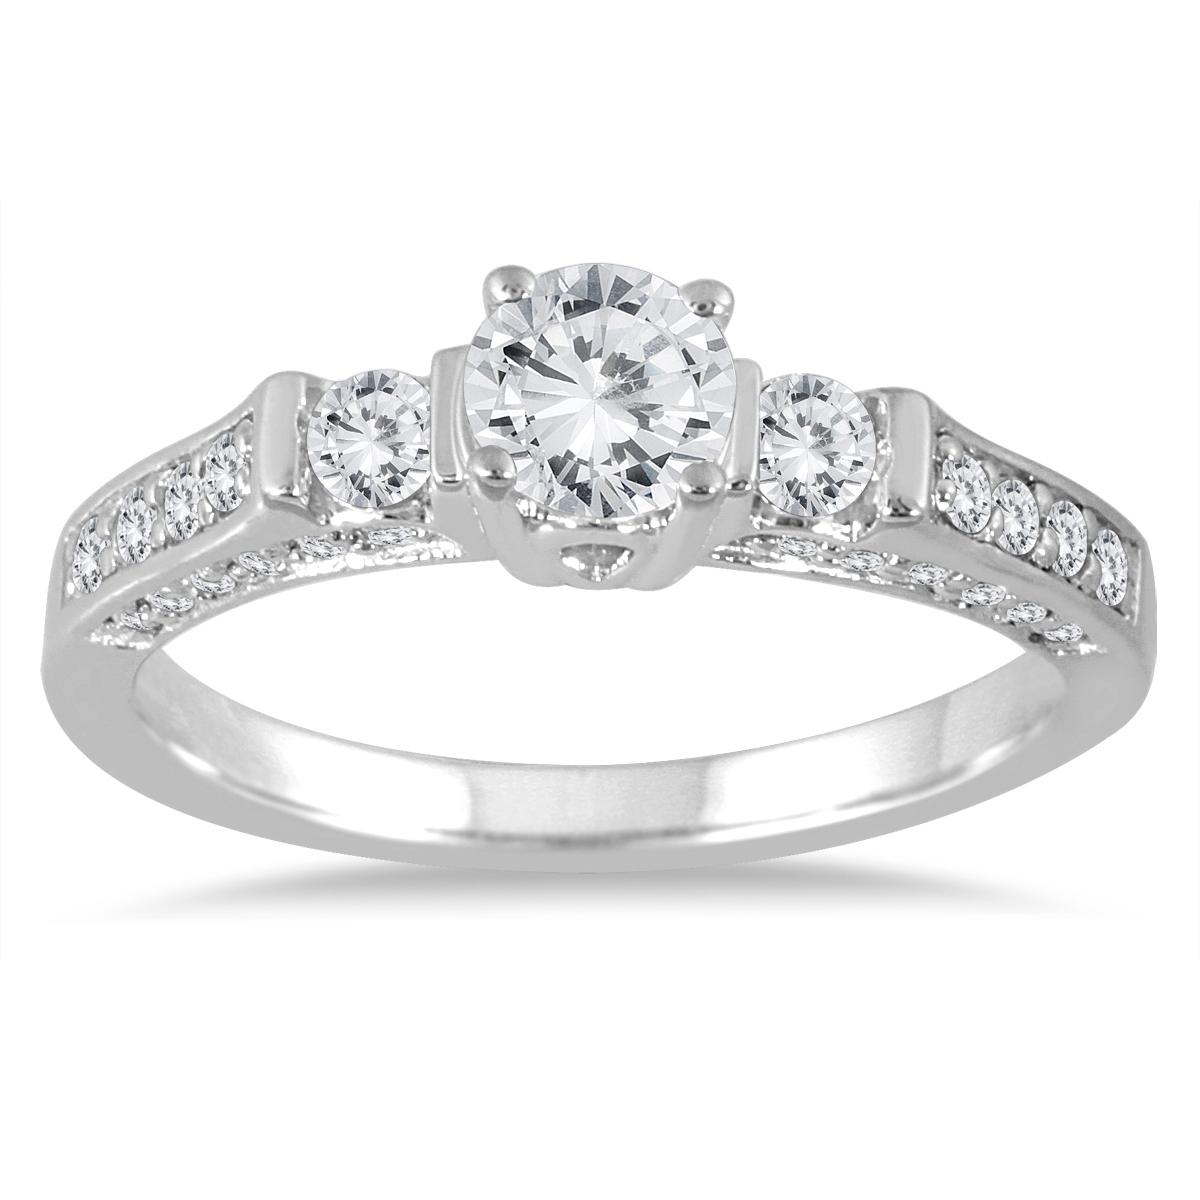 1 Carat TW Three Stone Diamond Ring in 14K White Gold